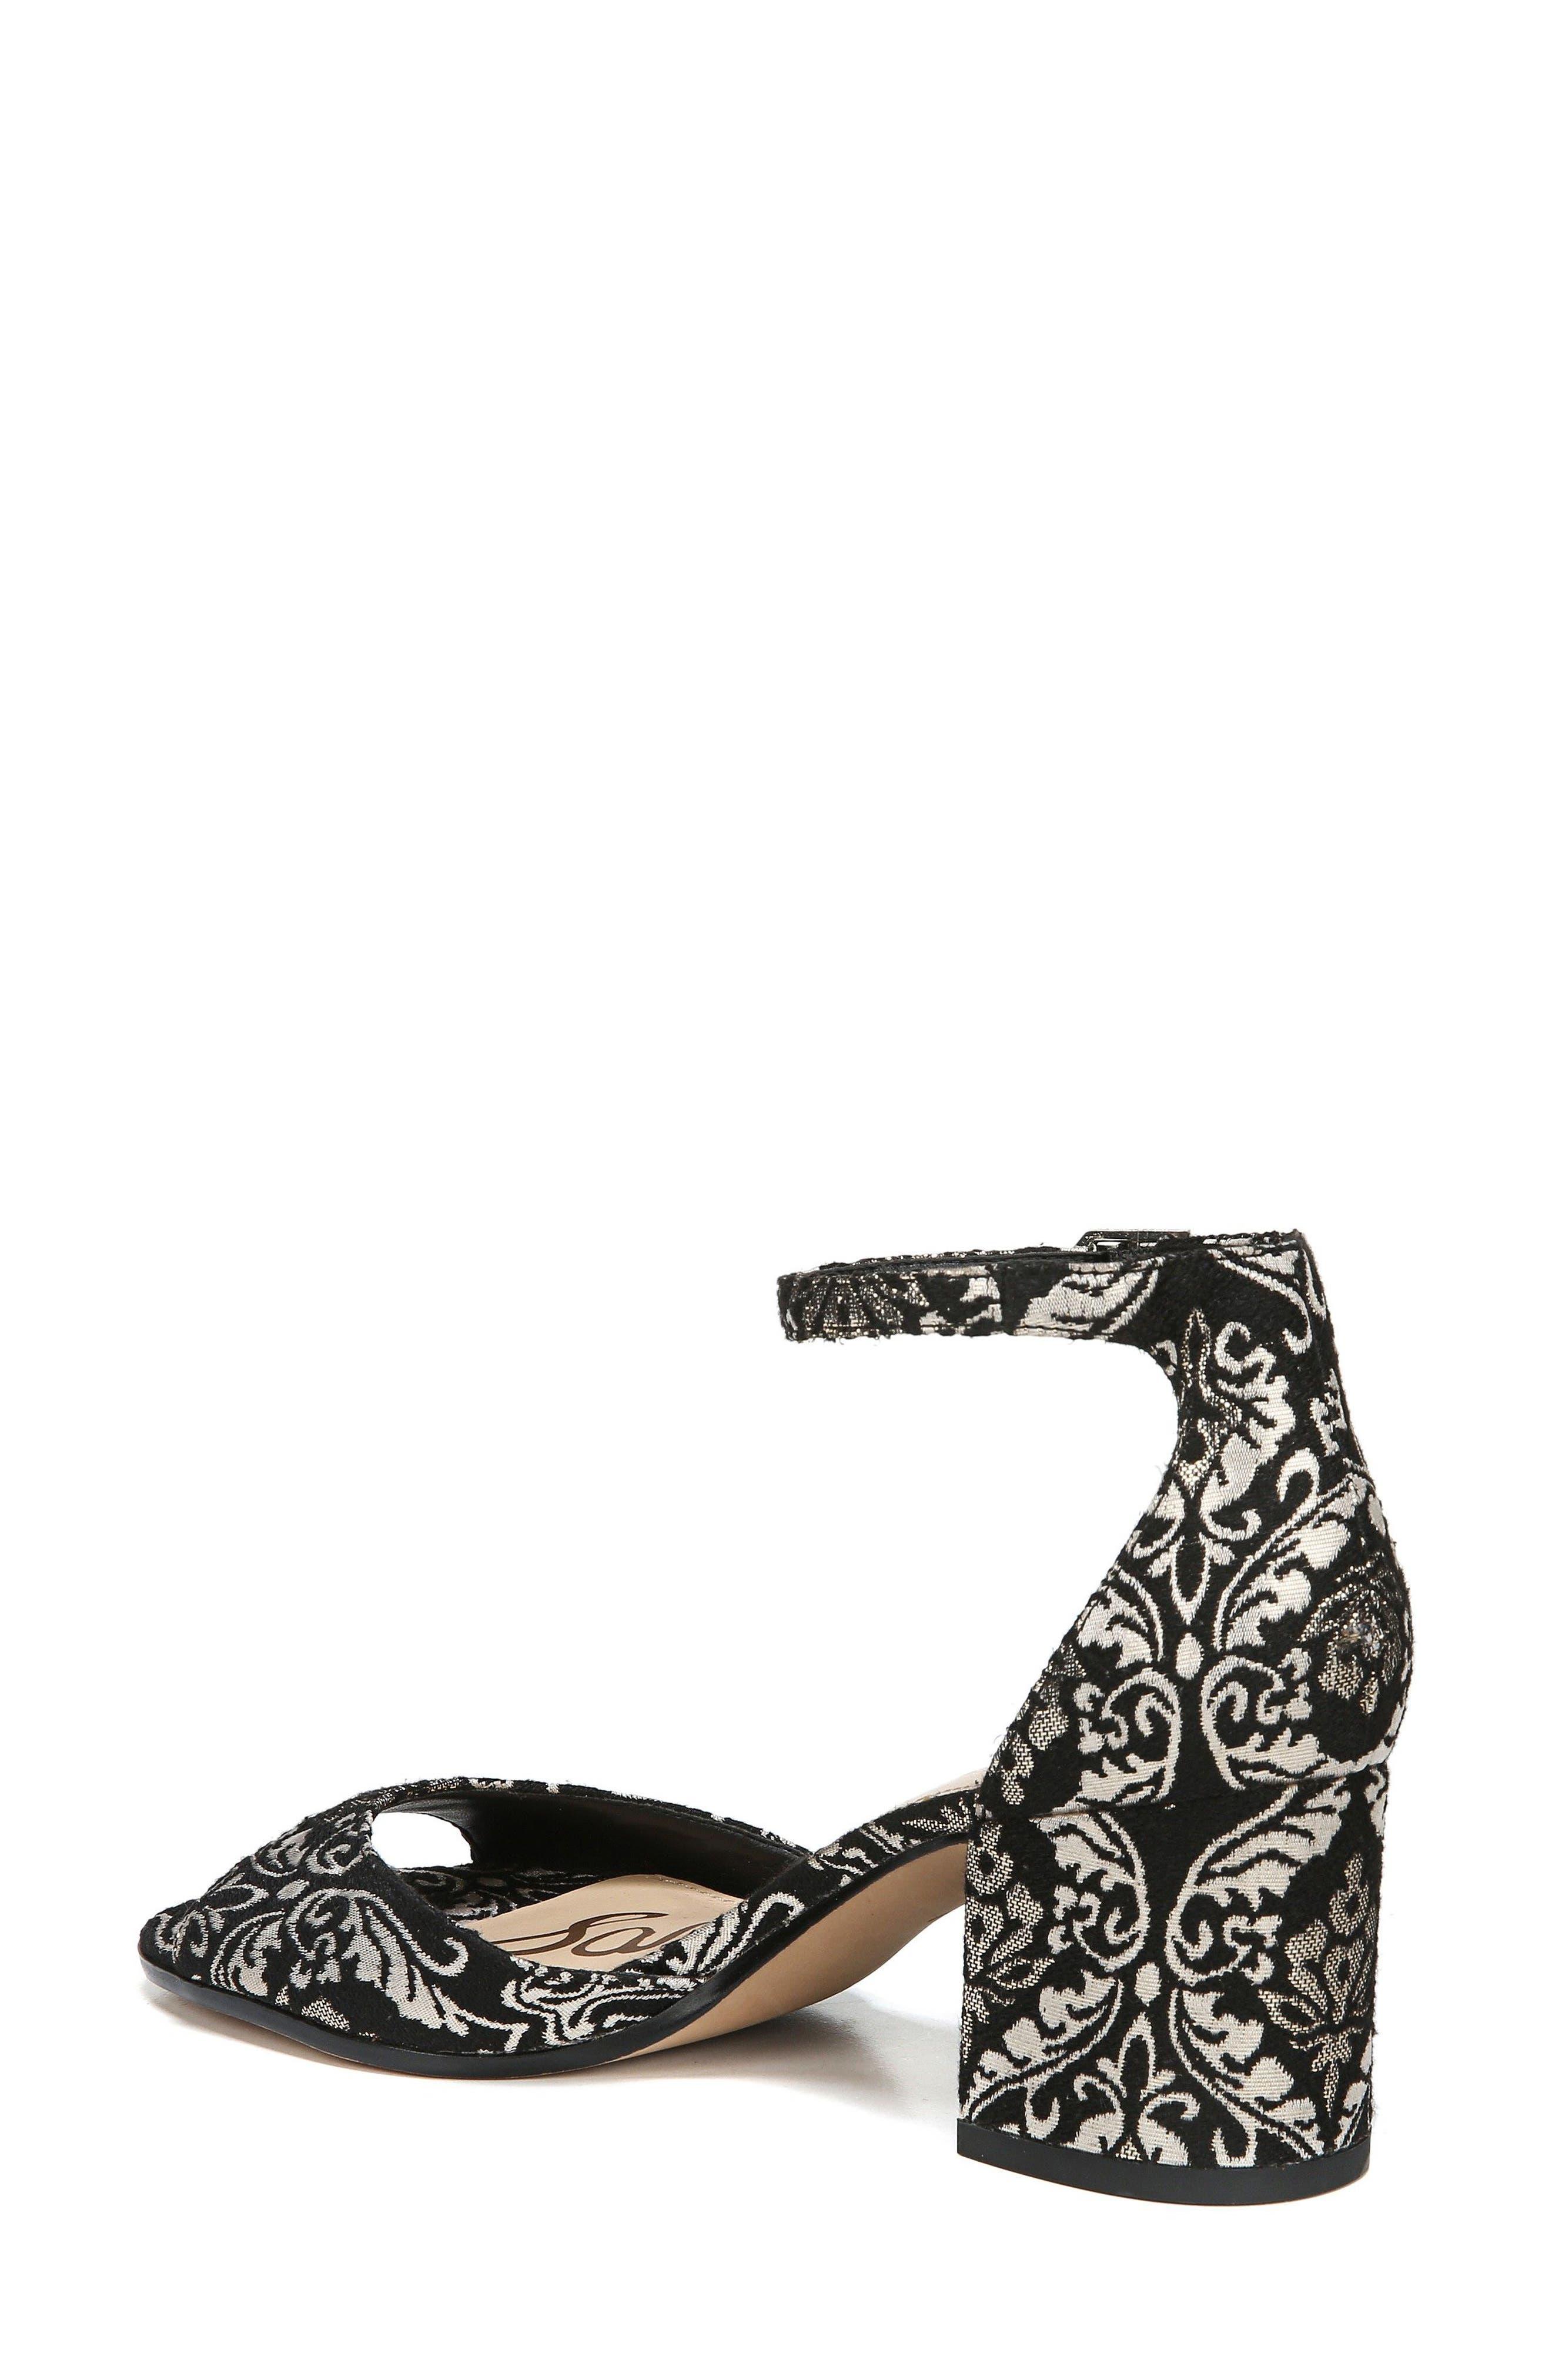 Alternate Image 2  - Sam Edelman Susie d'Orsay Ankle Strap Sandal (Women)